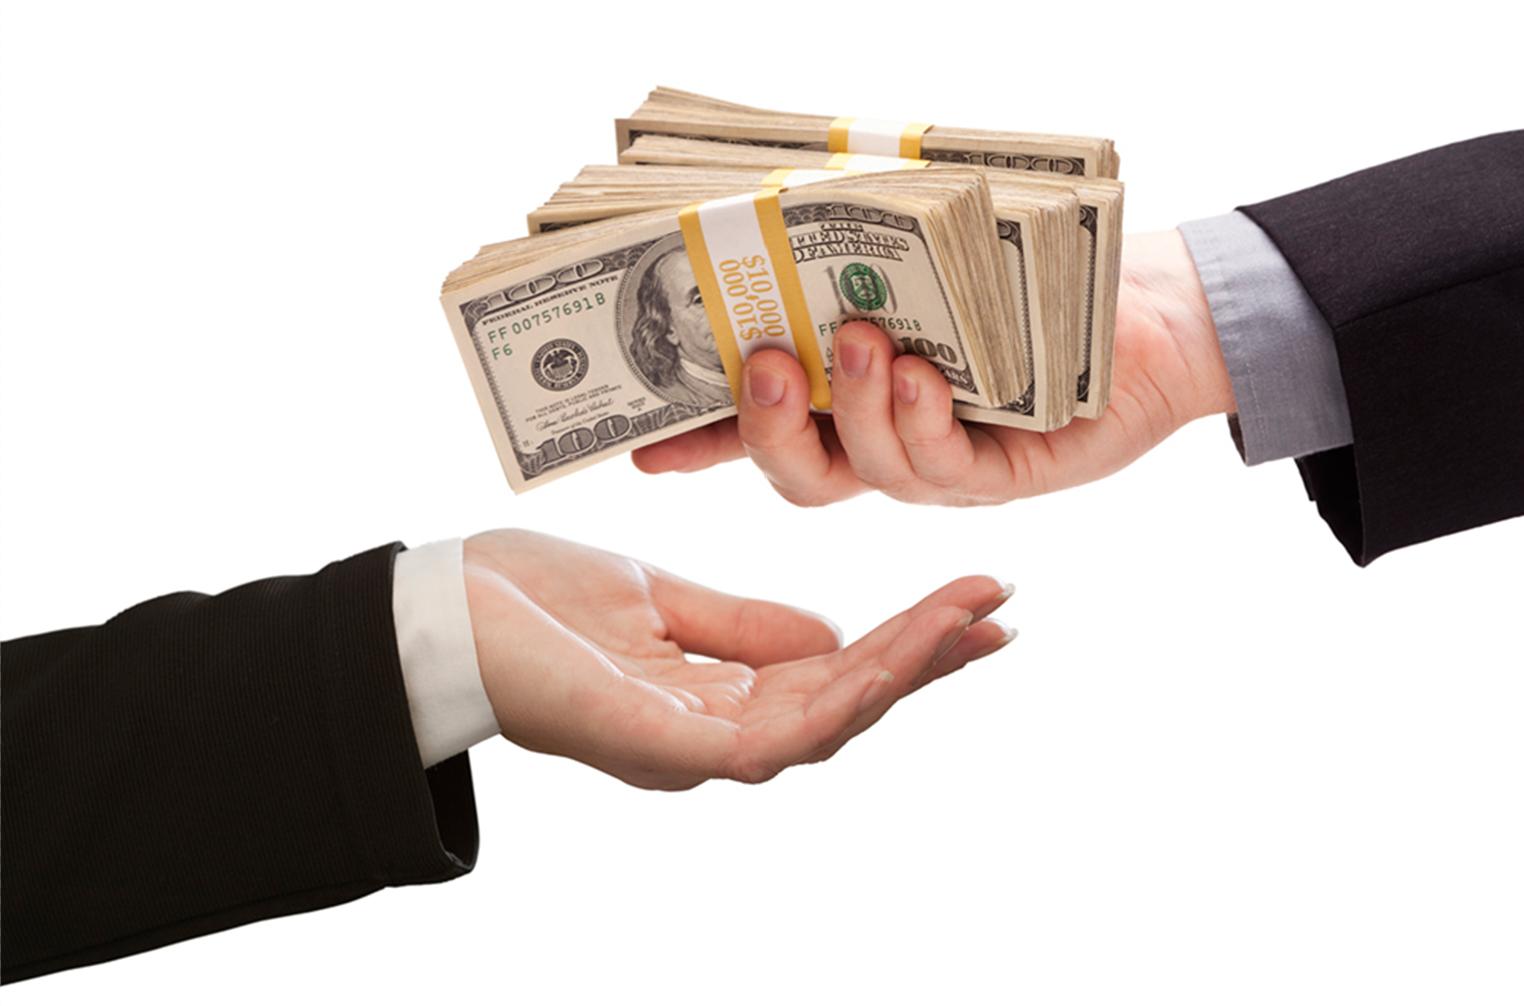 Картинки марта, картинки передача денег из рук в руки